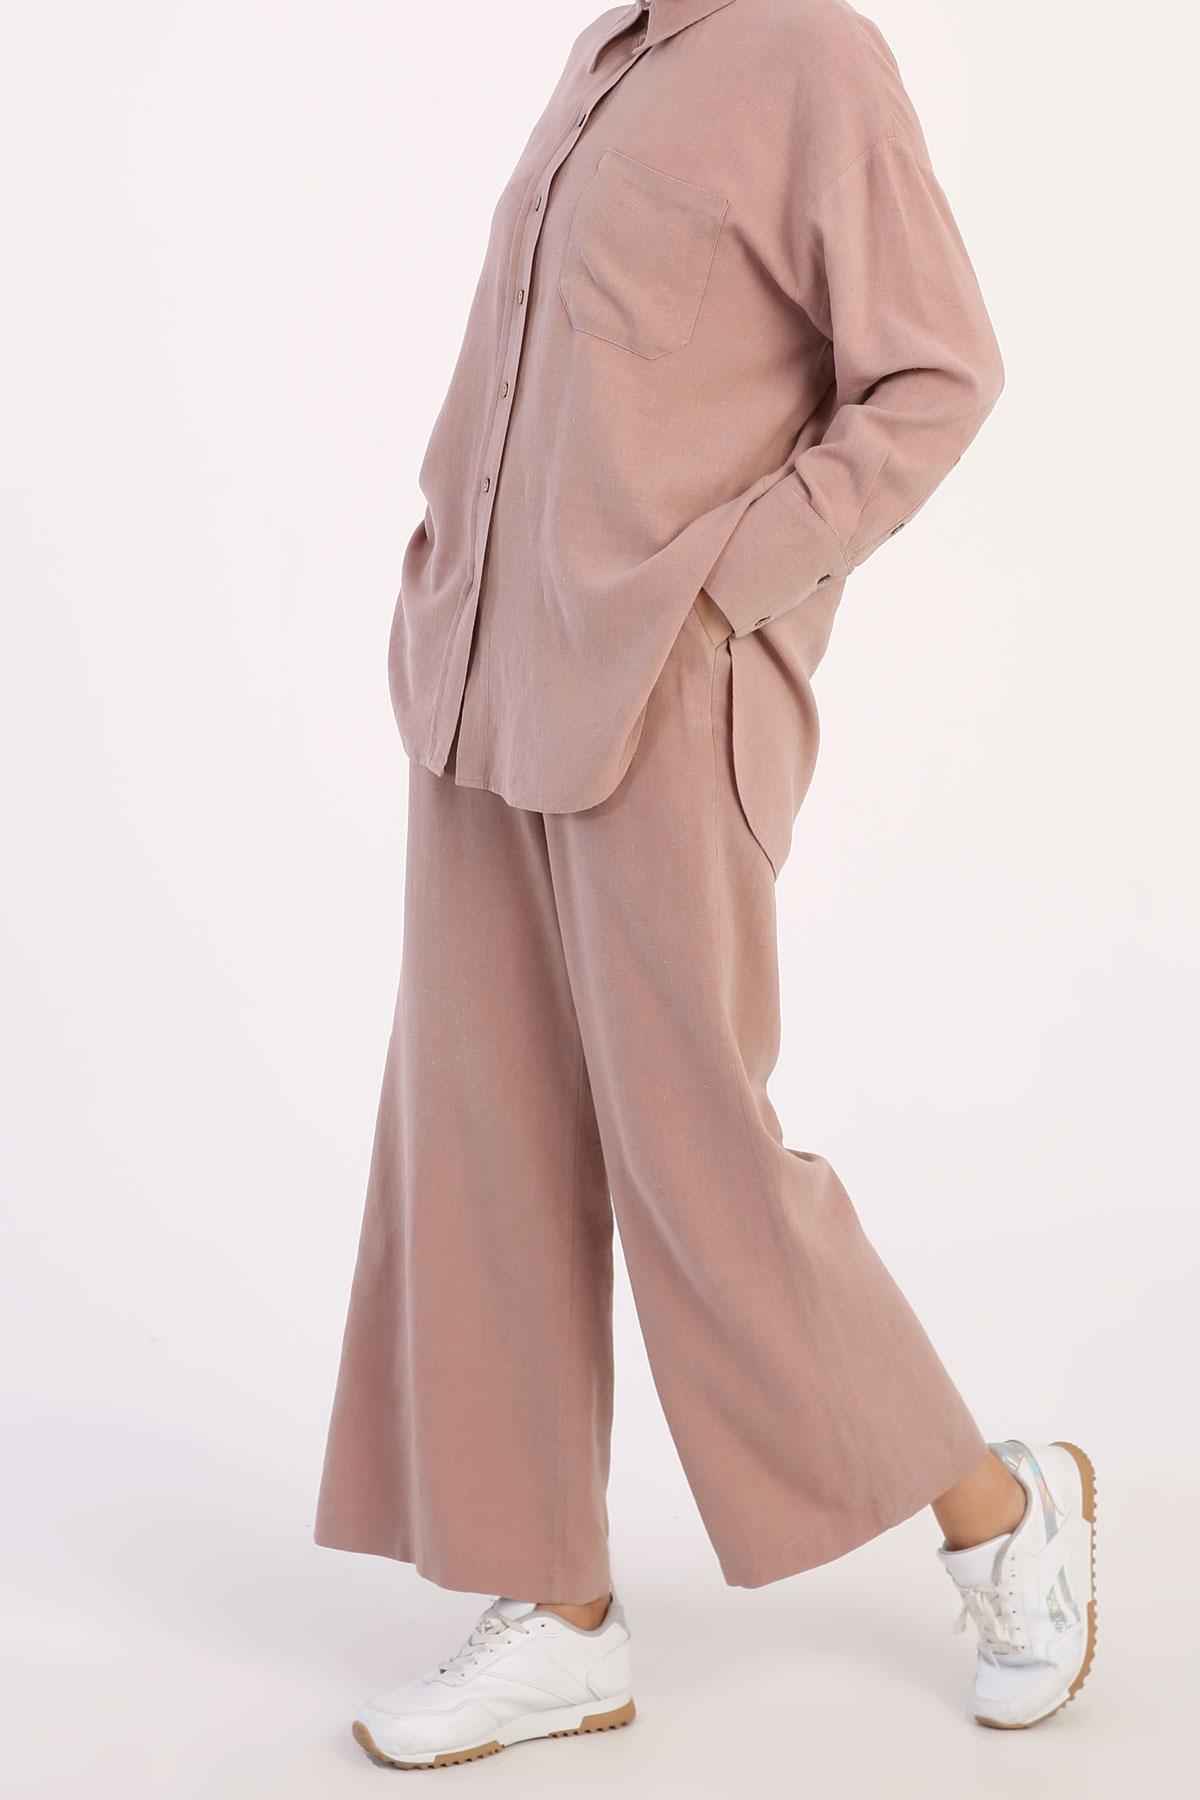 Comfy Long Shirt and Elastic Waist Pants Set